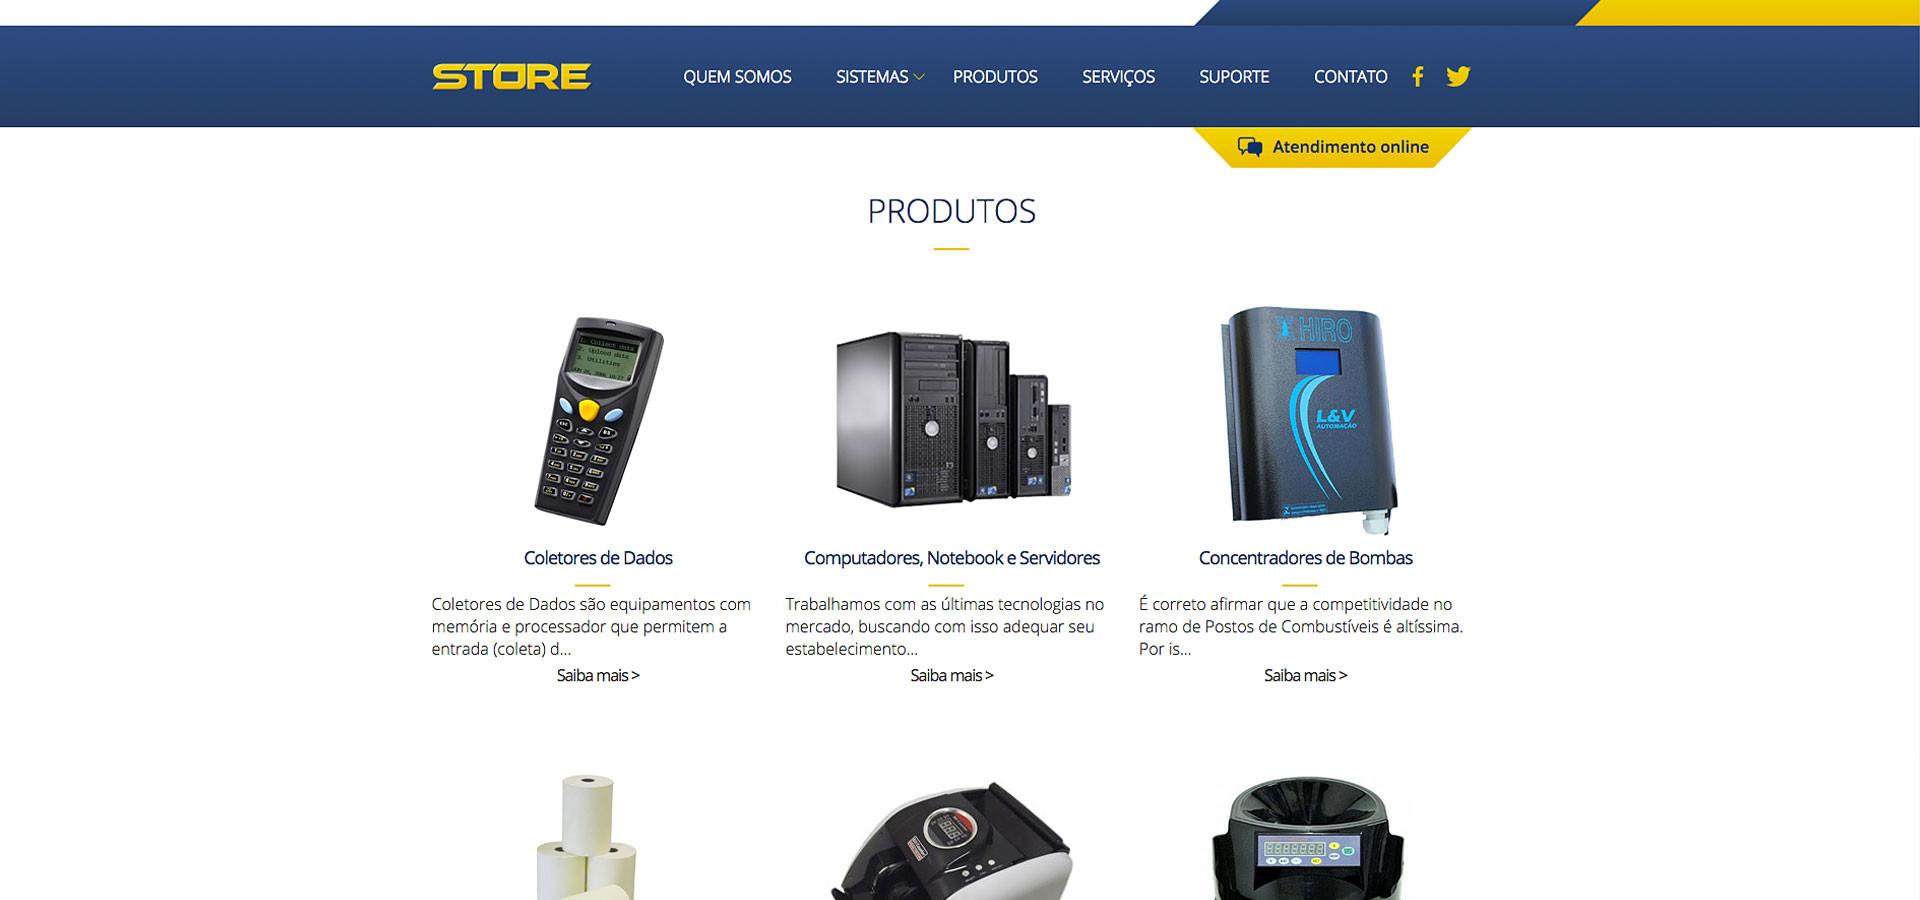 Produtos site Store Computer by Neurodigital